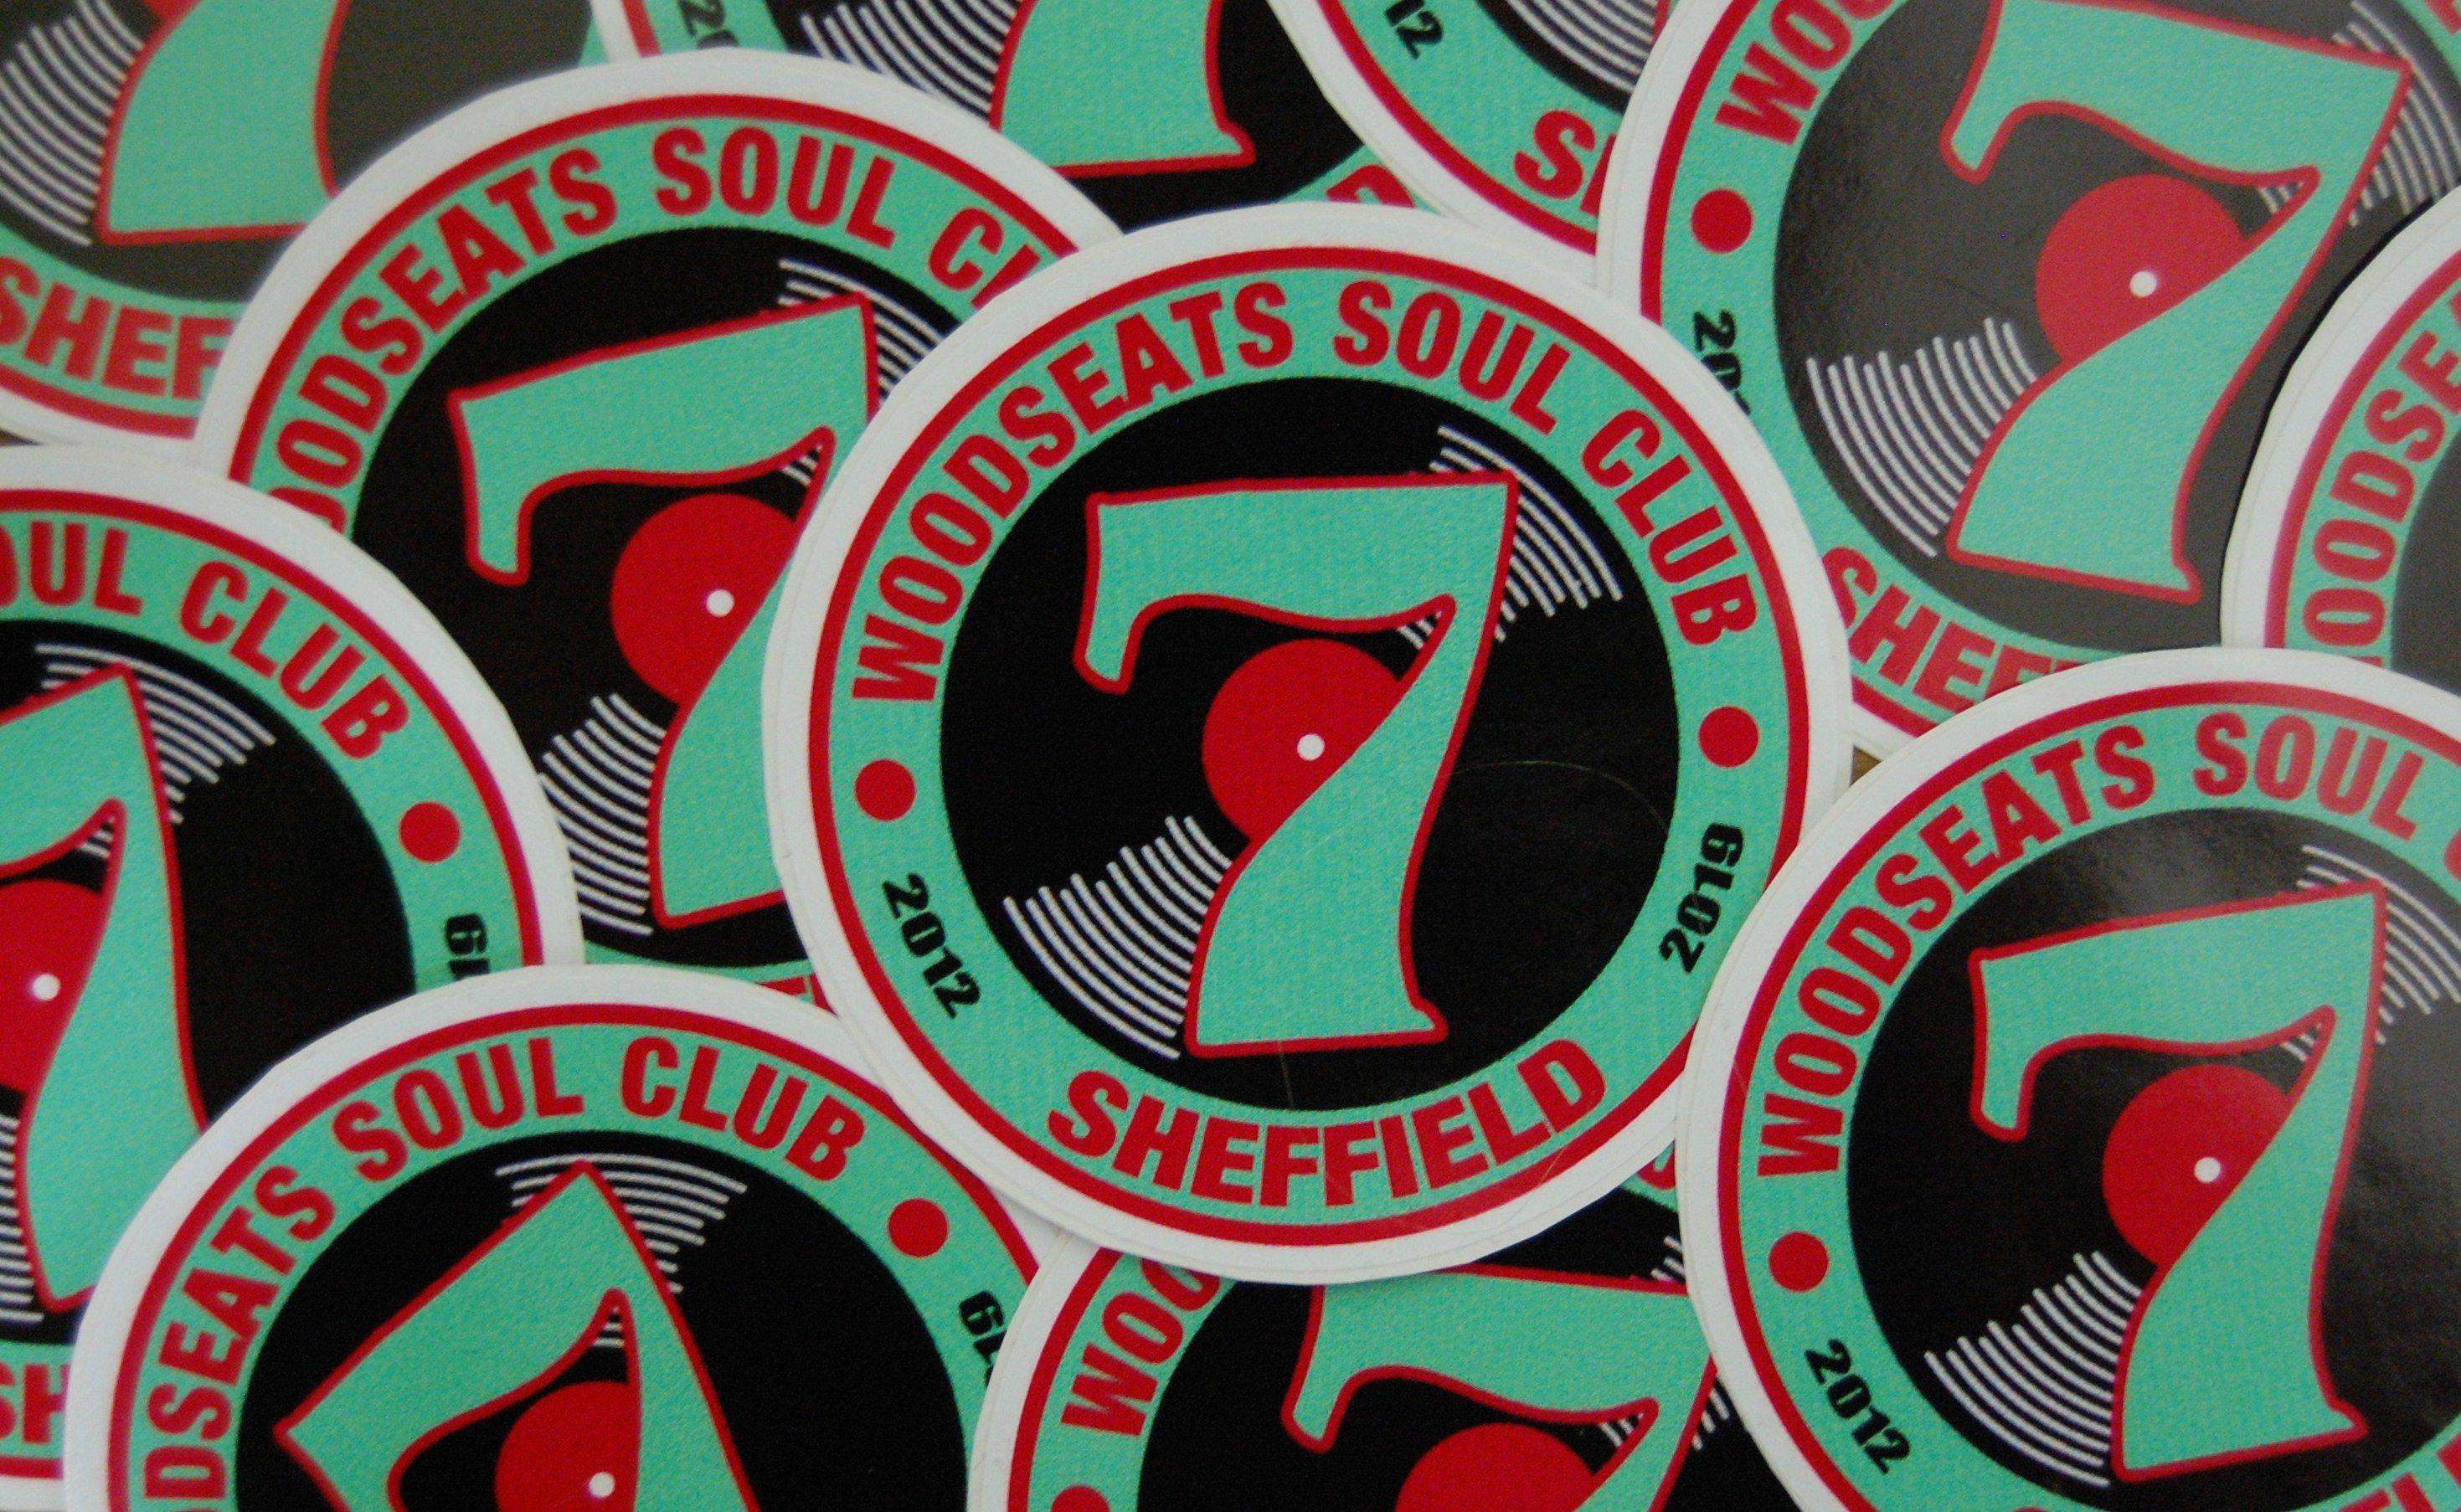 Woodseats Soul Club flyer